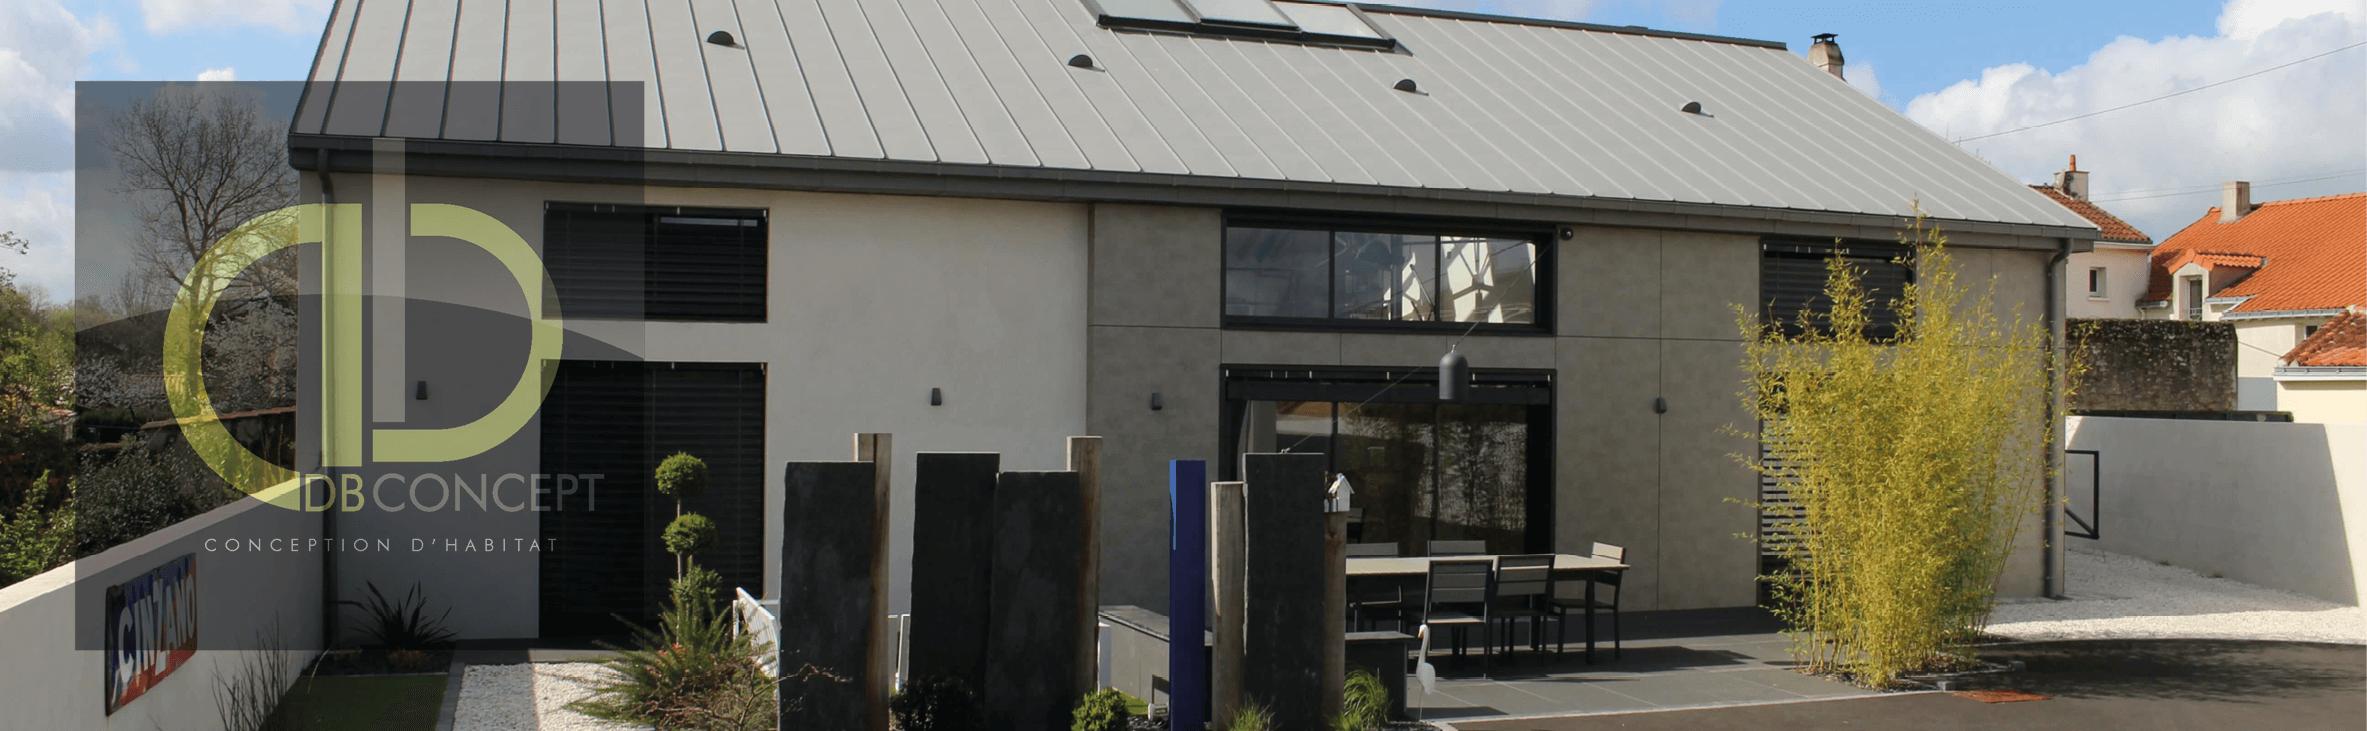 entete-slide-dbconcept-maitre-oeuvre-construction-neuf-renovation